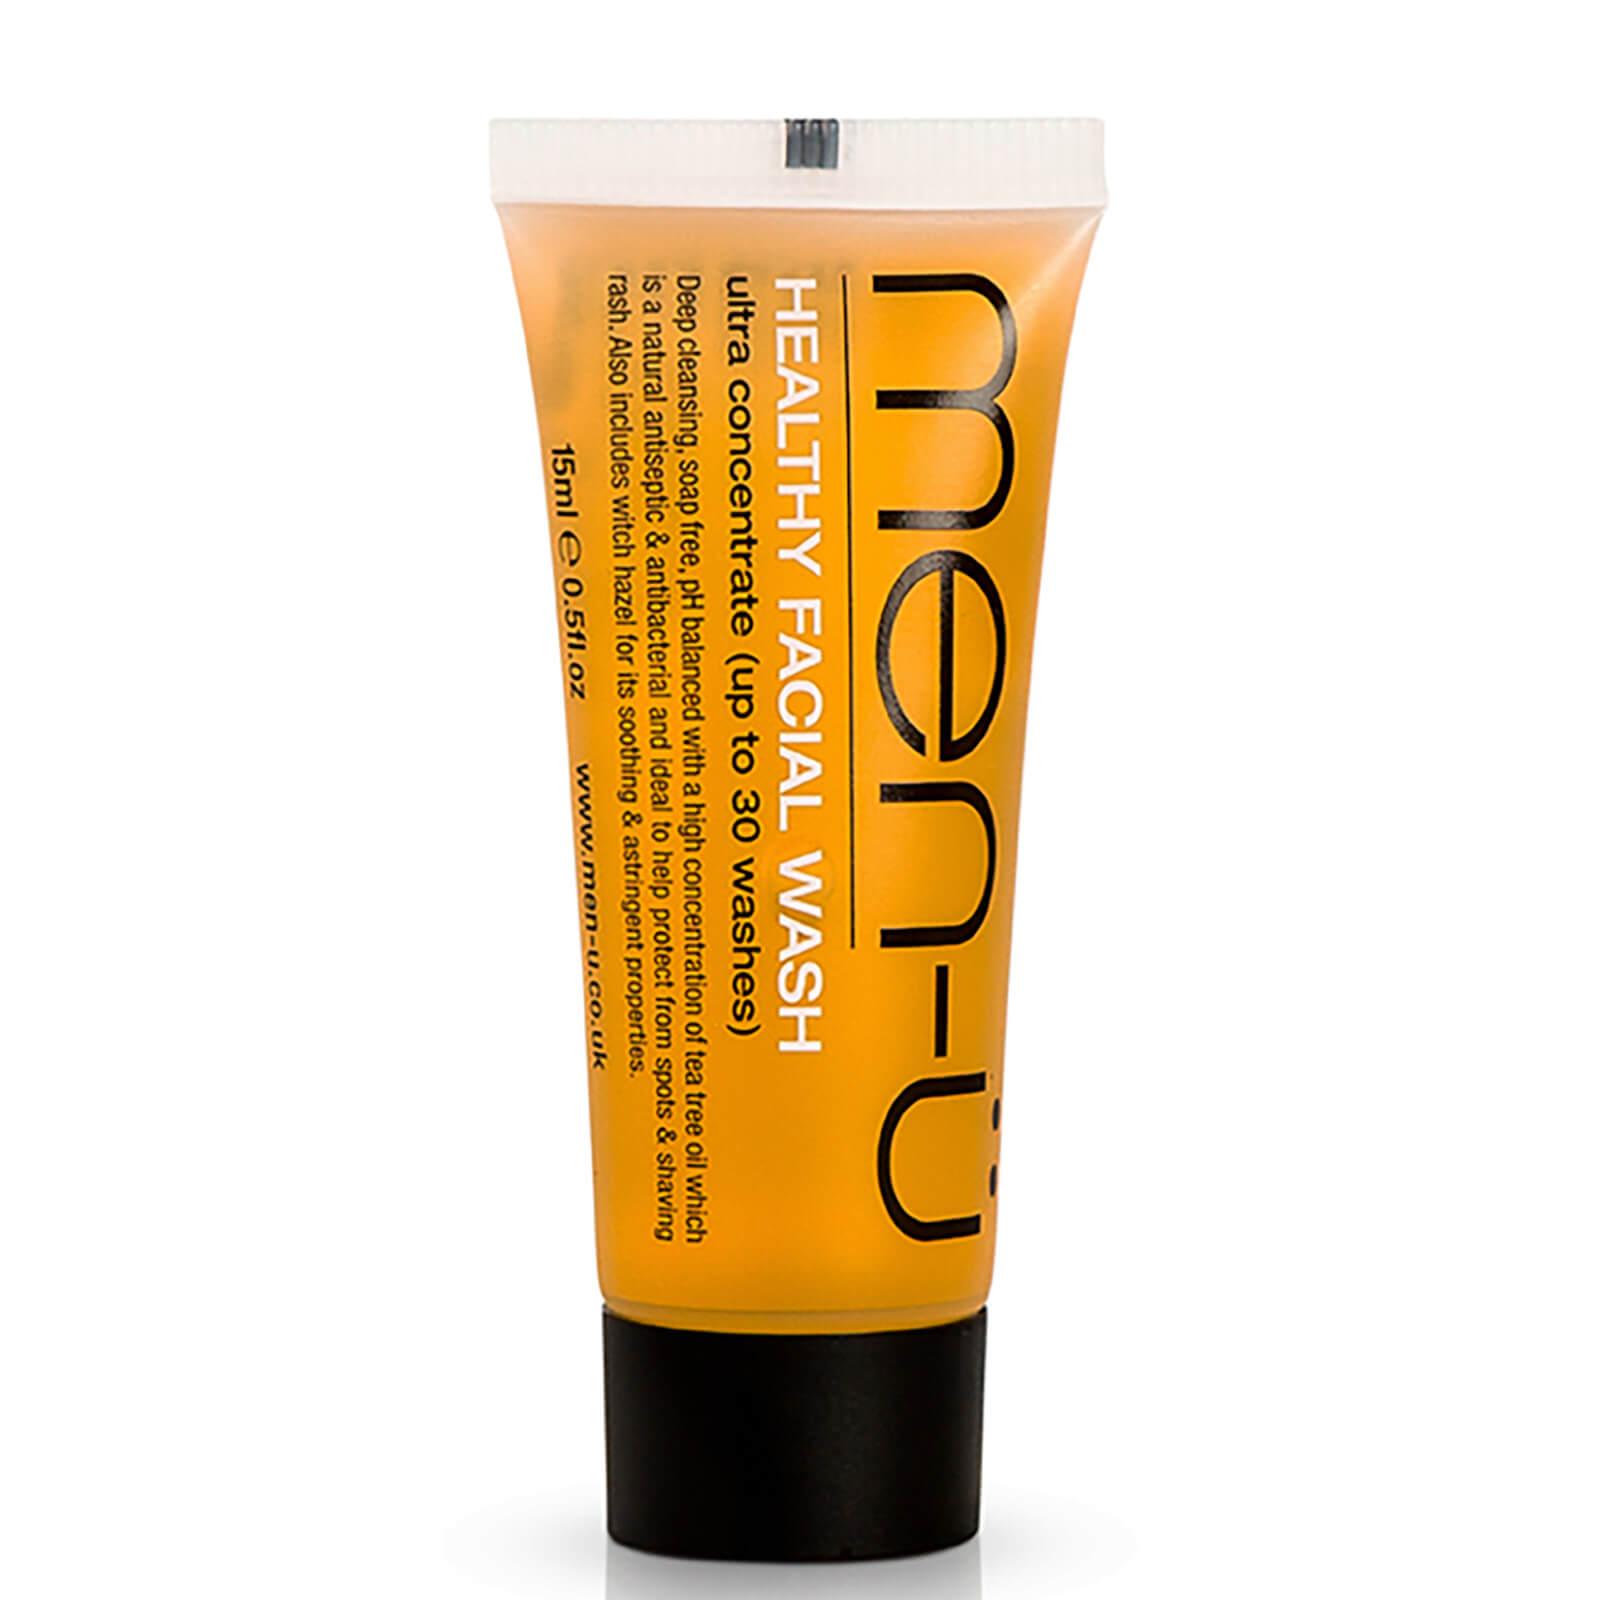 Look Fantastic coupon: men-u men-u Buddy Healthy Facial Wash Tube 1 oz